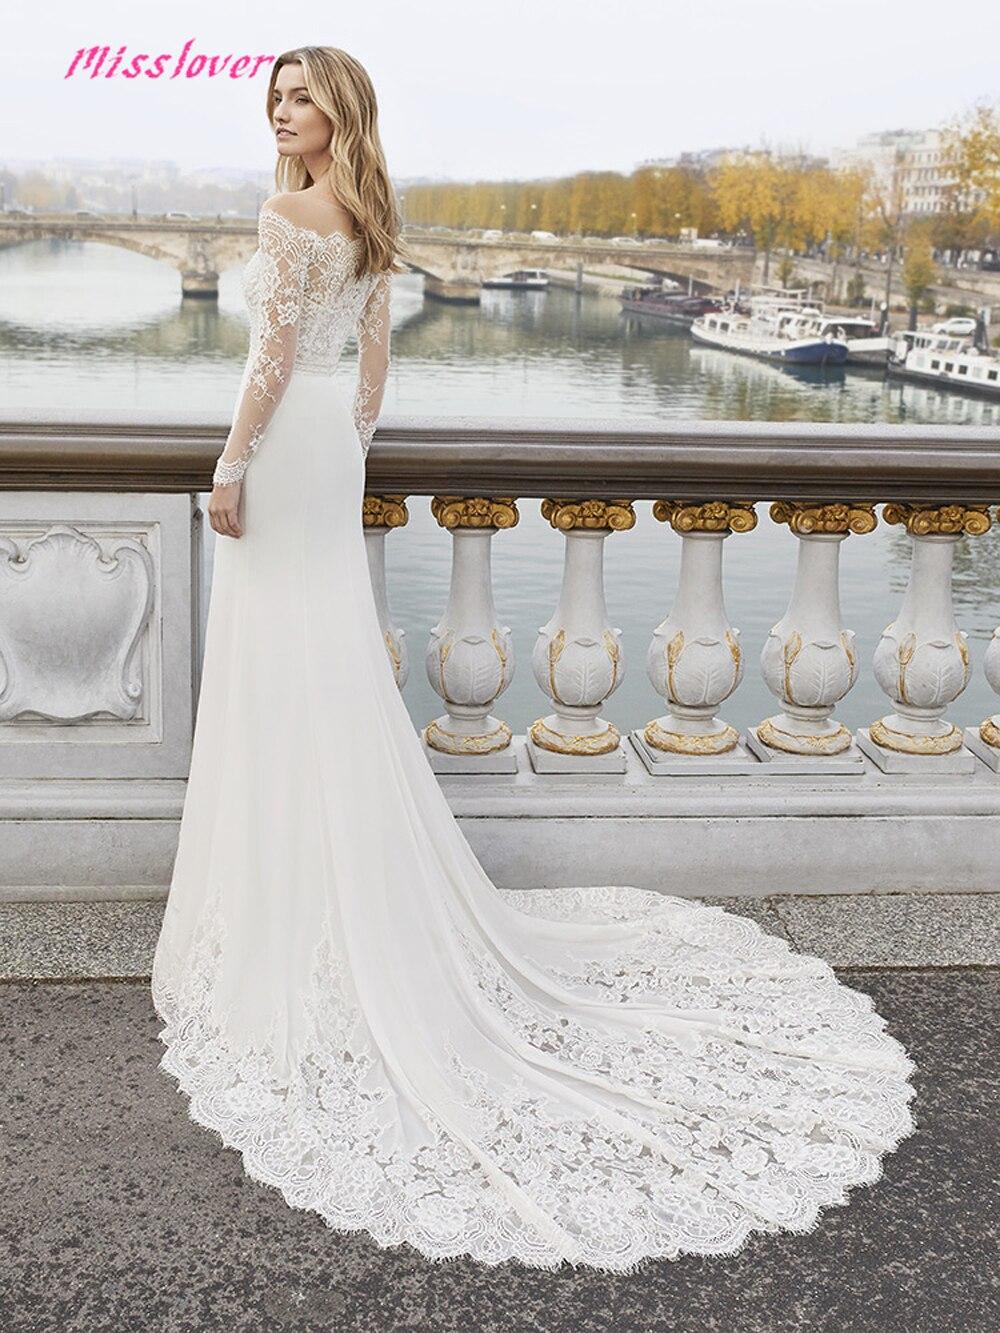 ef1d8c8828 Vestido de noiva sexy Illusion Mermaid Wedding Dress Luxury lace 2019 new  Bridal Gown Bride Dress Court Train Robe de mariee ~ Top Deal July 2019